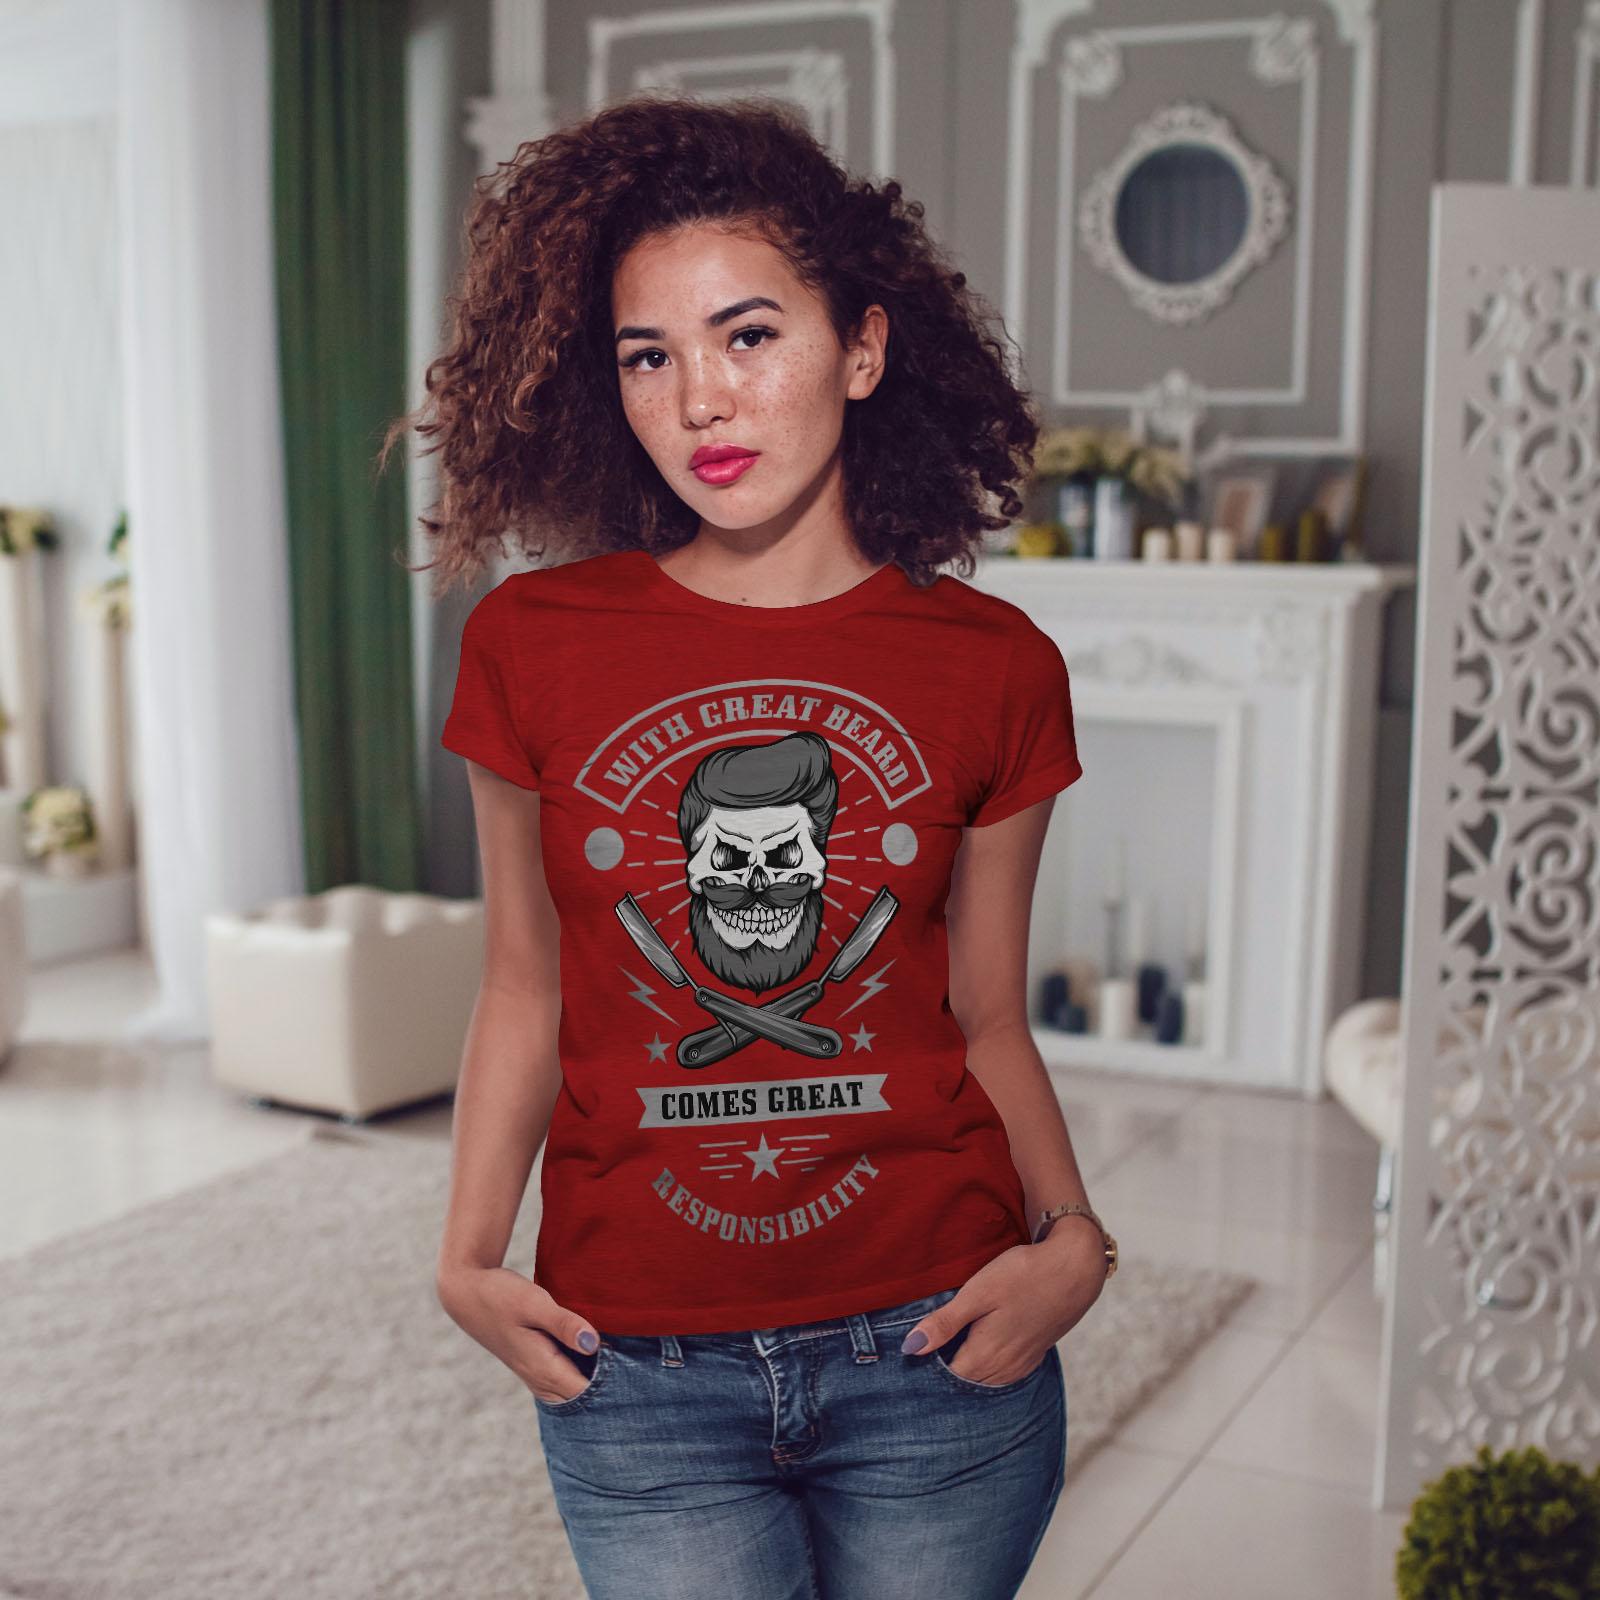 miniature 11 - Wellcoda Great Beard Style Funny Womens T-shirt,  Casual Design Printed Tee